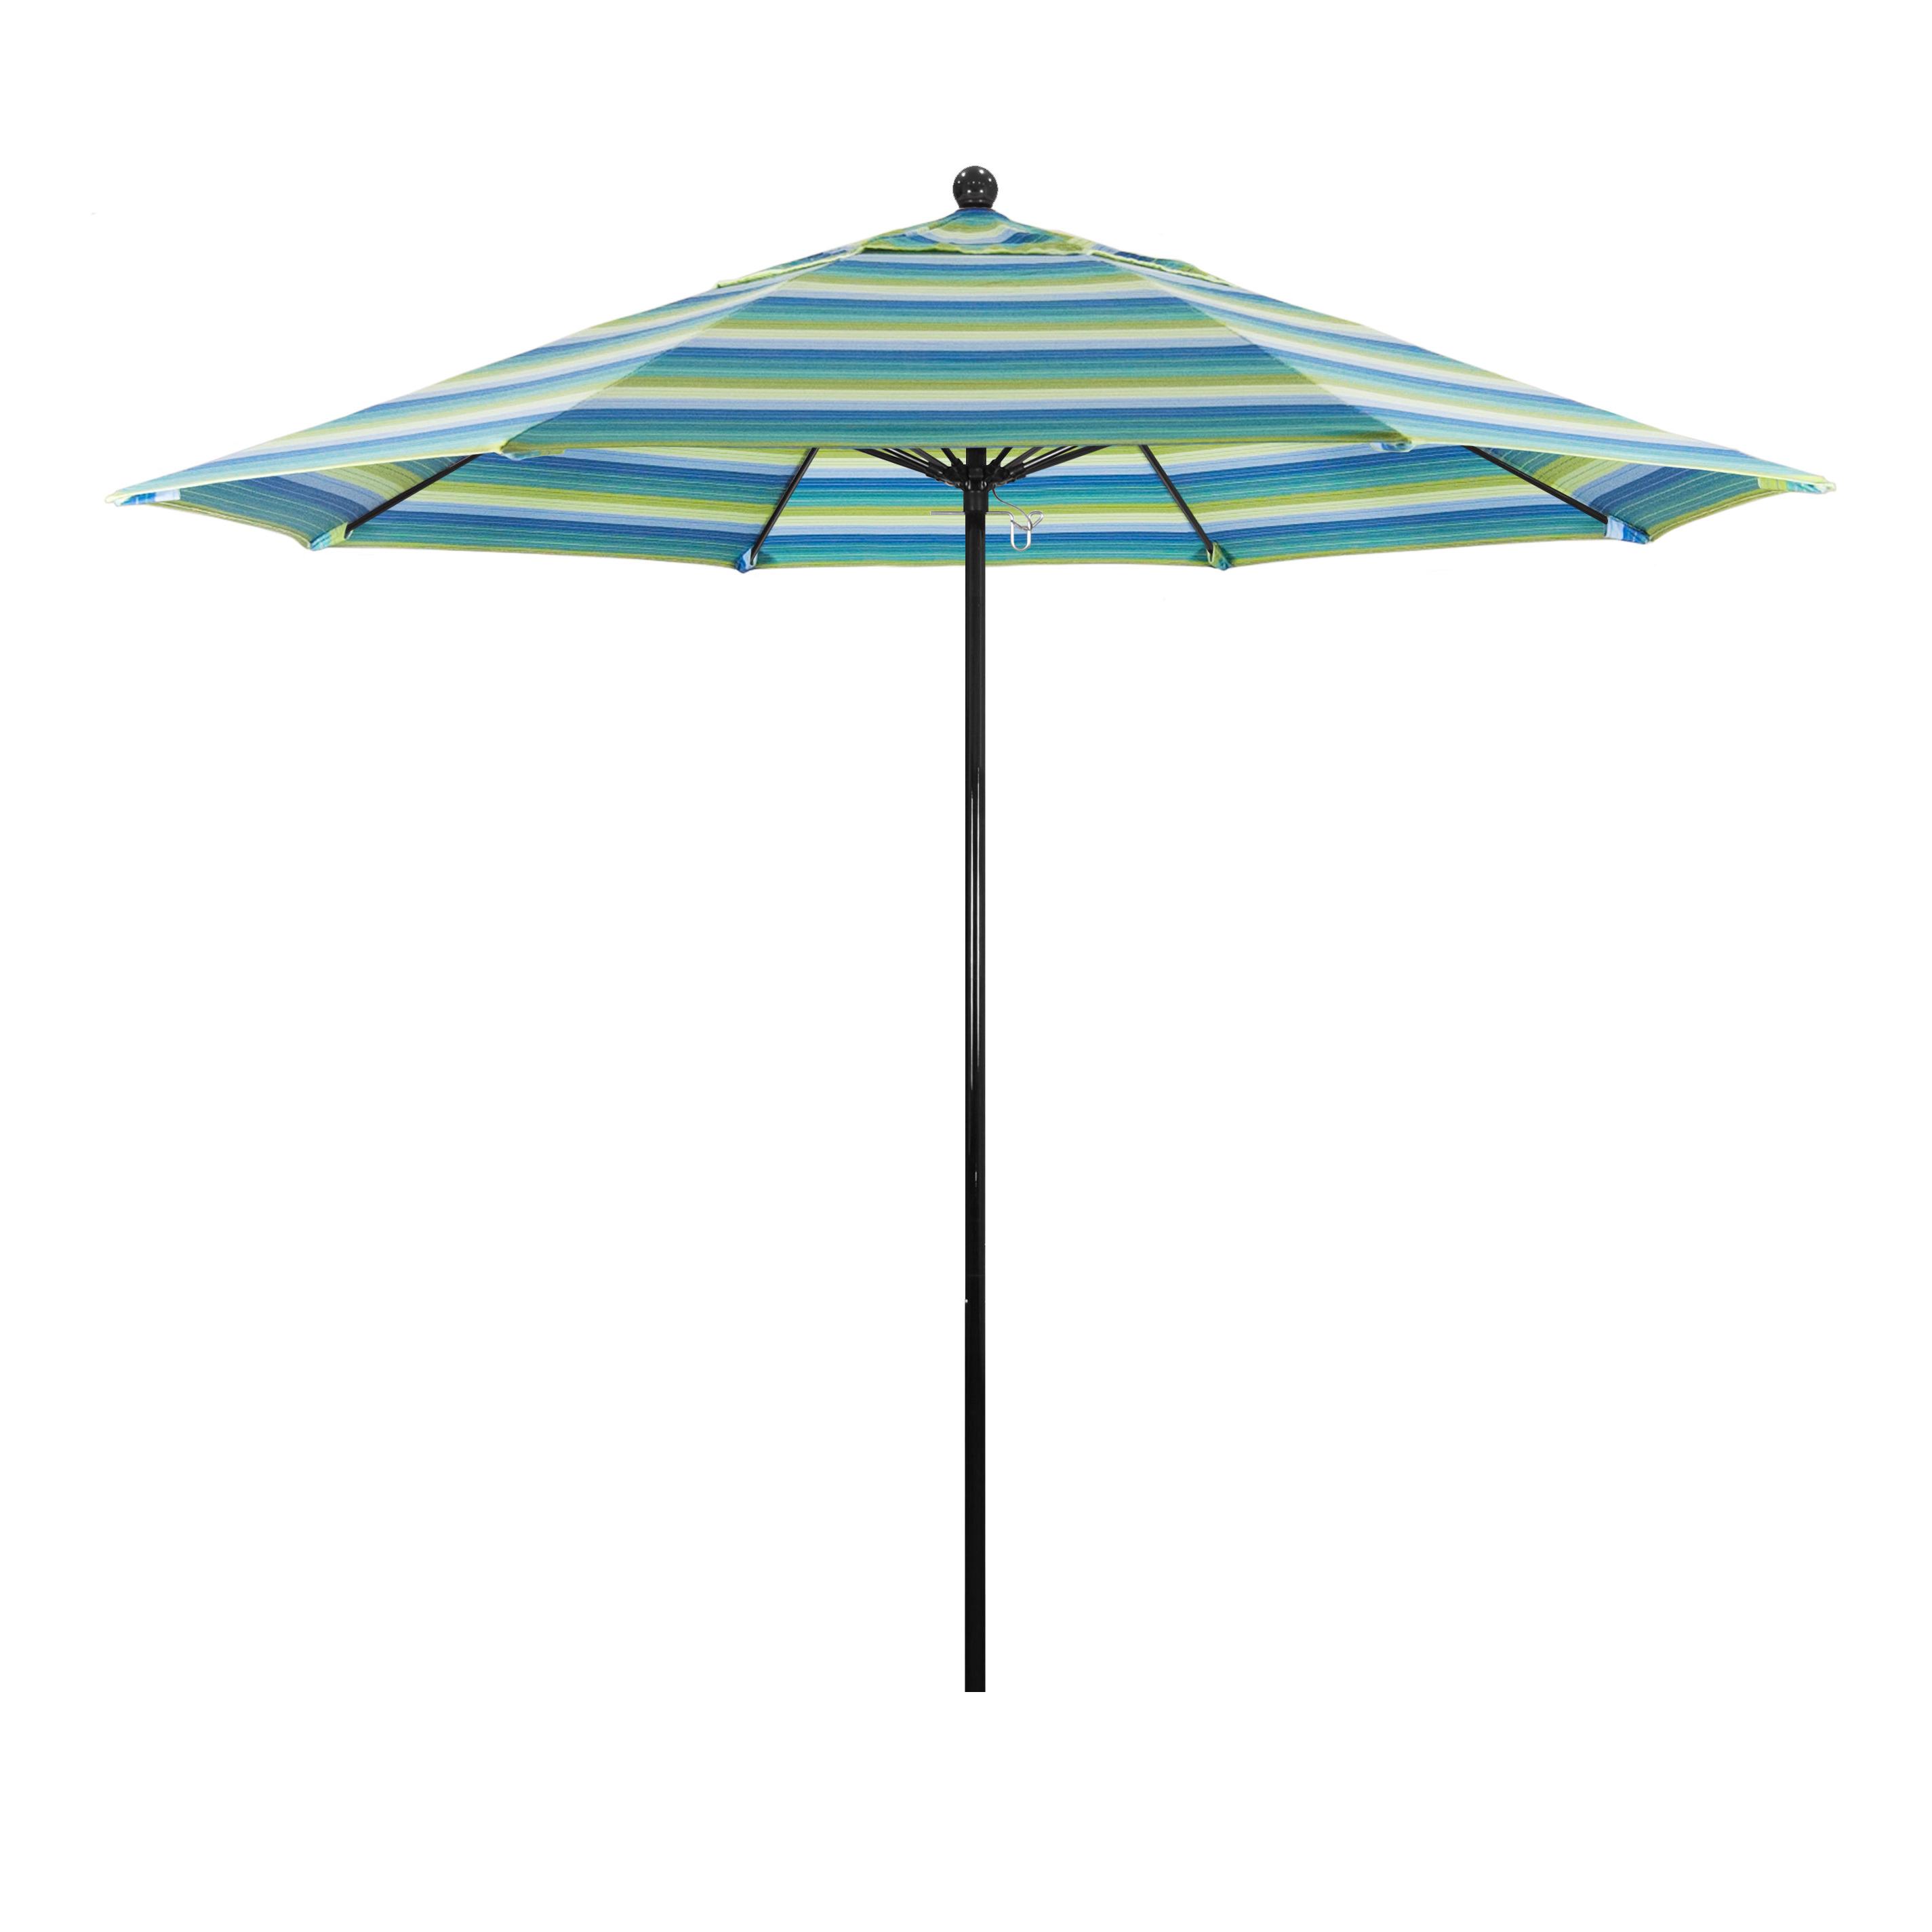 Oceanside Series 9' Market Sunbrella Umbrella Regarding Recent Bayside Series Cantilever Umbrellas (View 15 of 20)